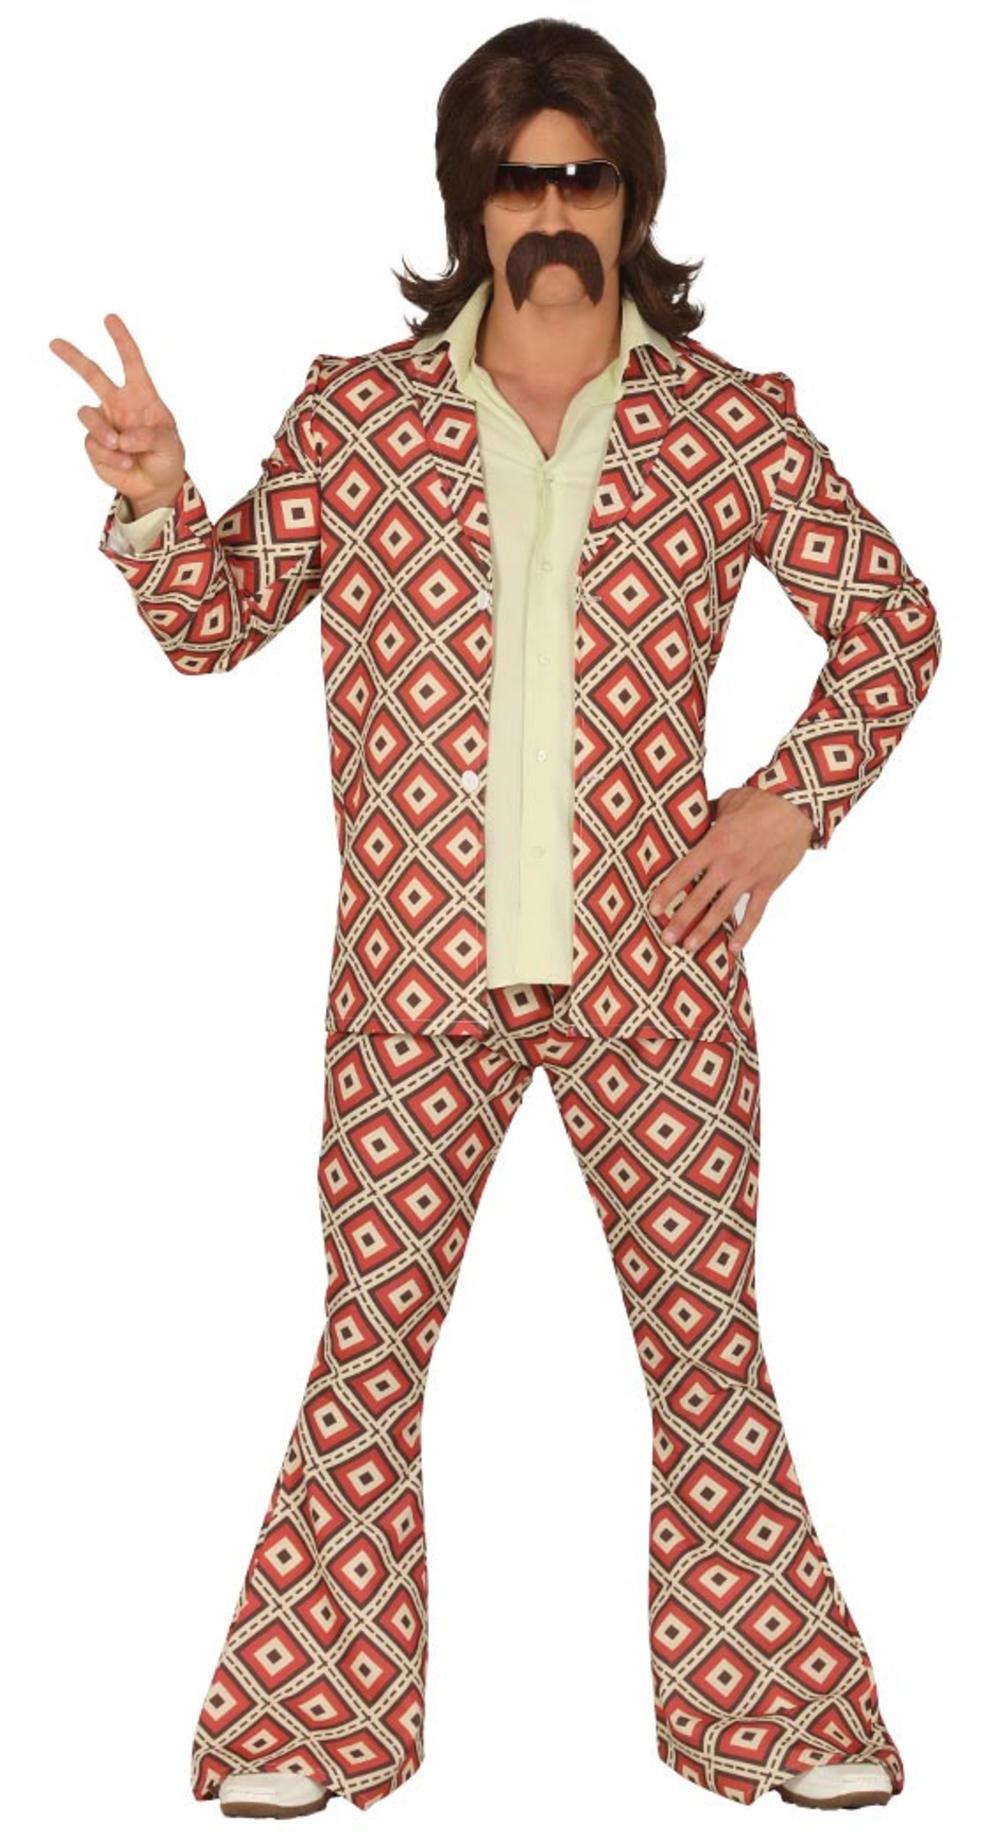 70s Man Adults Costume